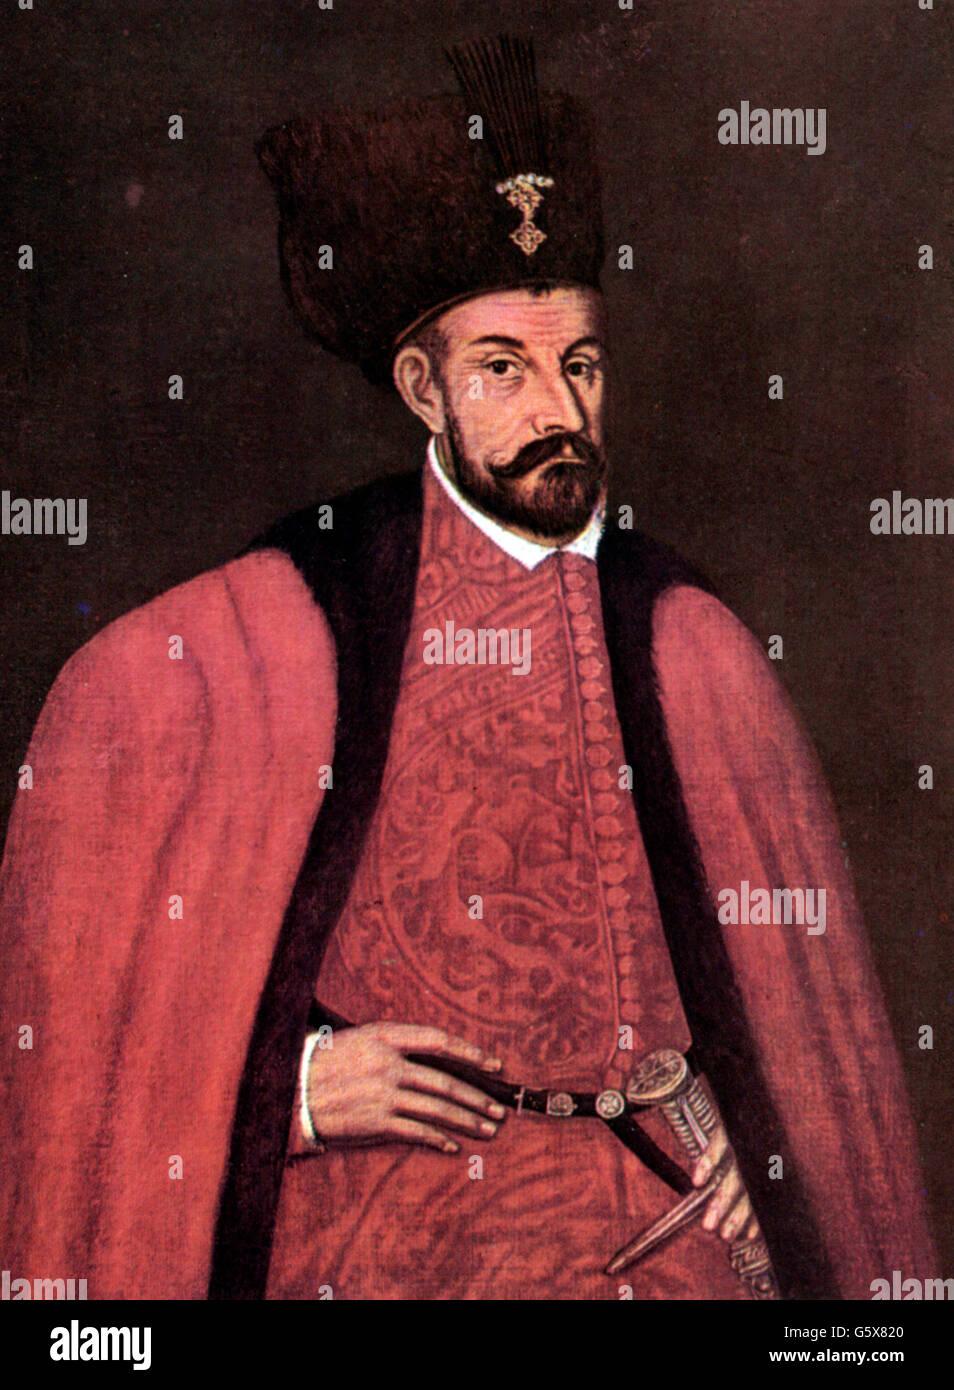 Stephen Bathory, 27.9.1533 - 12.12.1586, King of Poland 14.12.1575 - 12.12.1586, portrait, art postcard after painting, - Stock Image